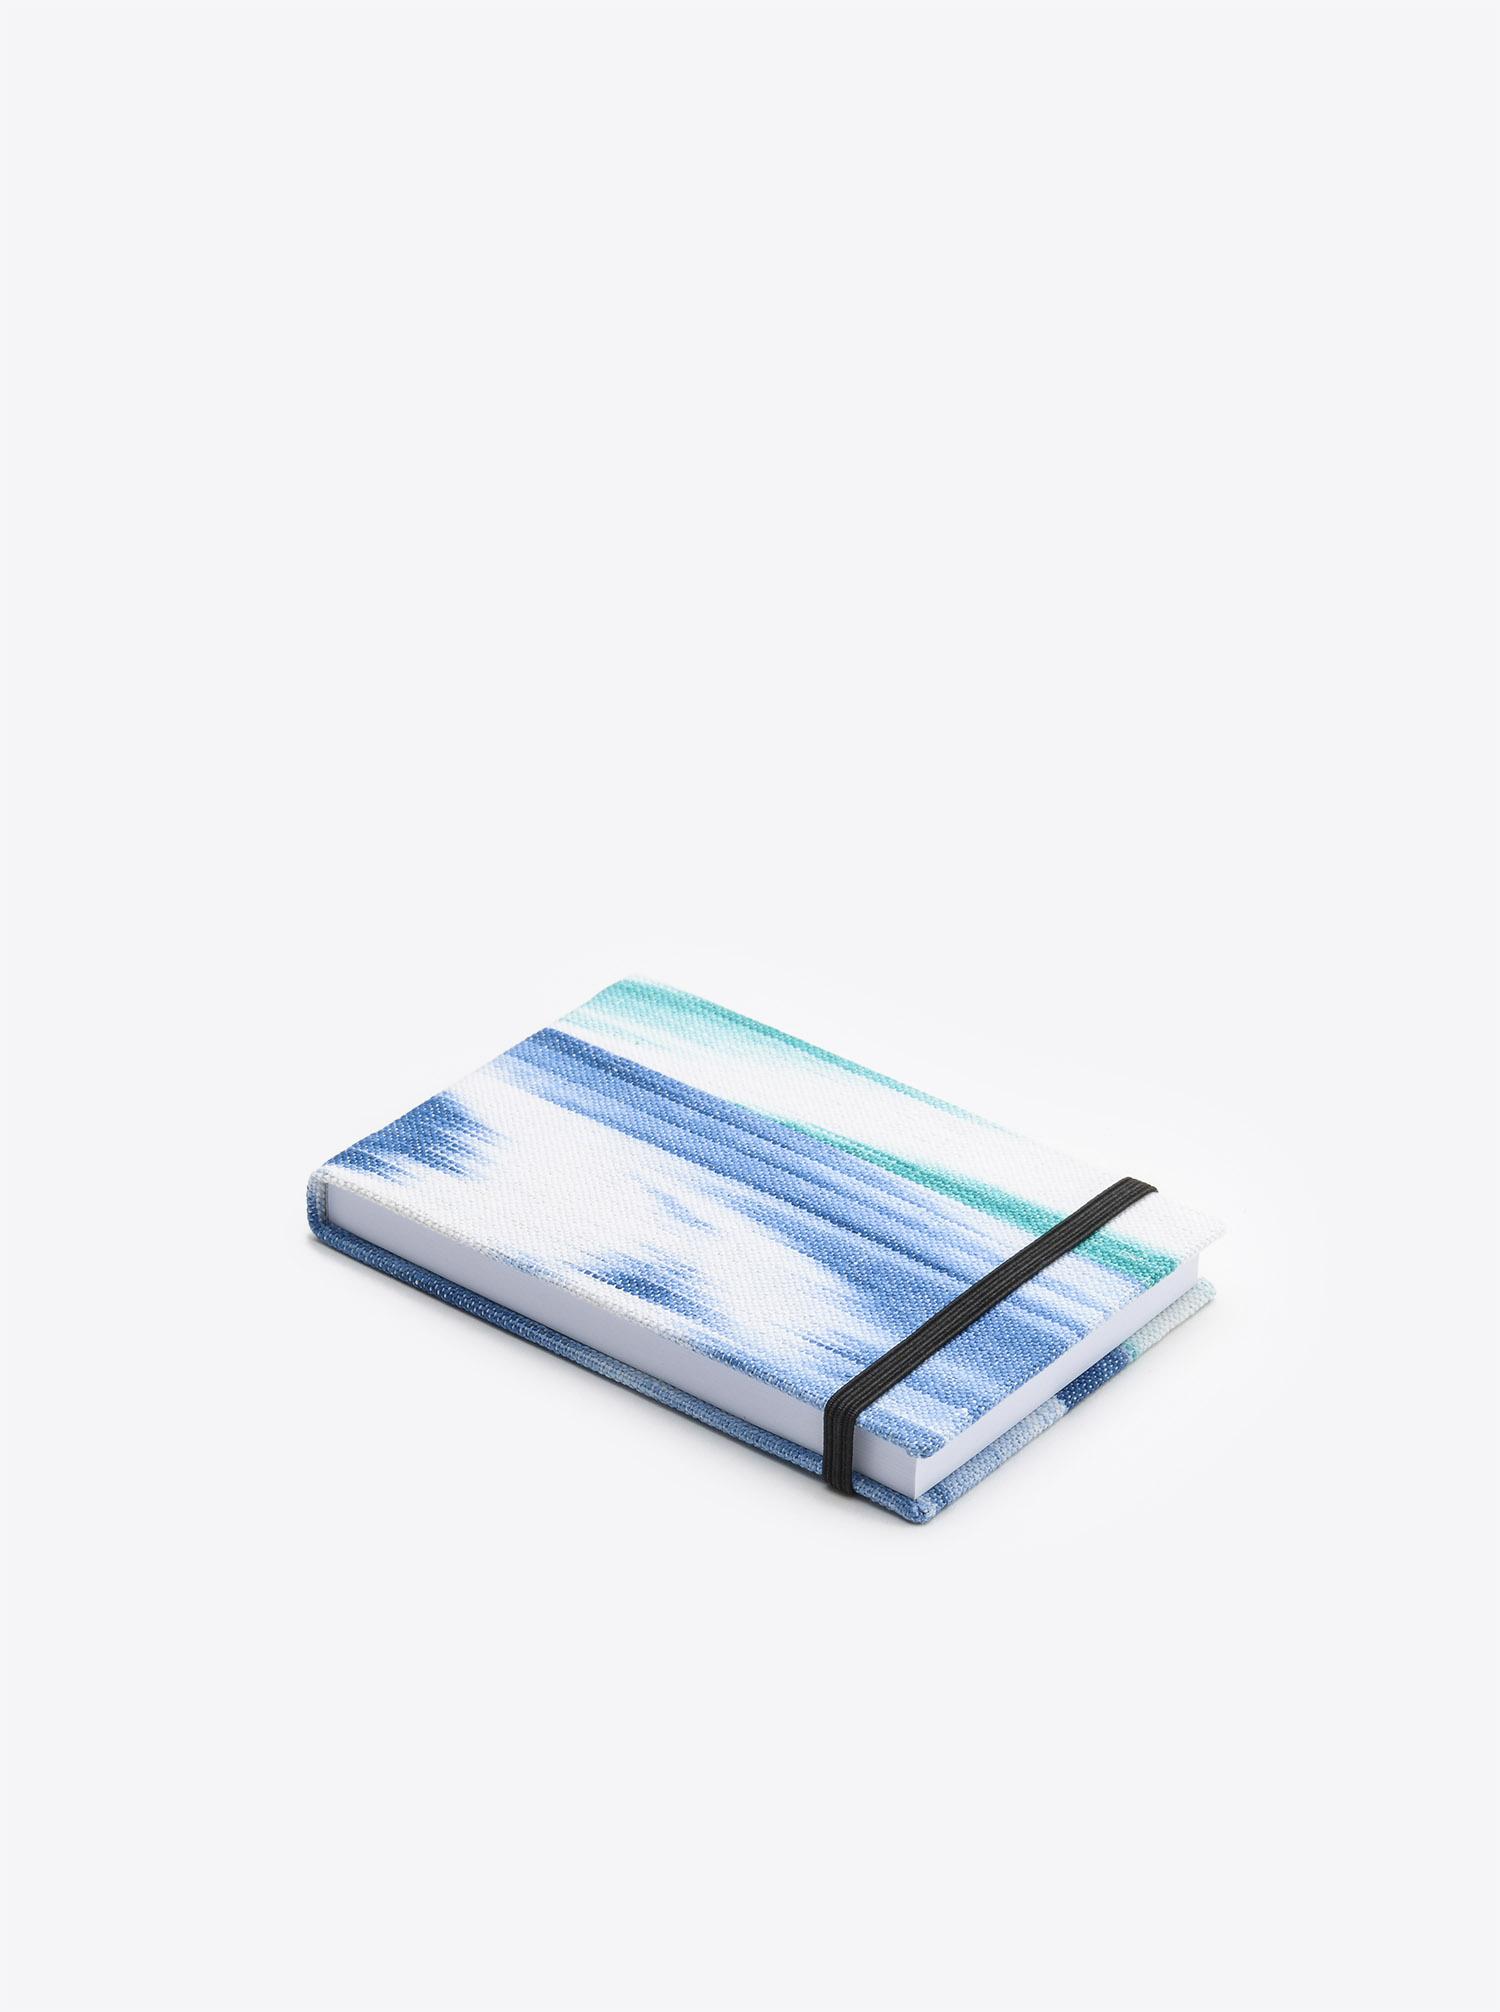 Notizblock Ikat blau türkis